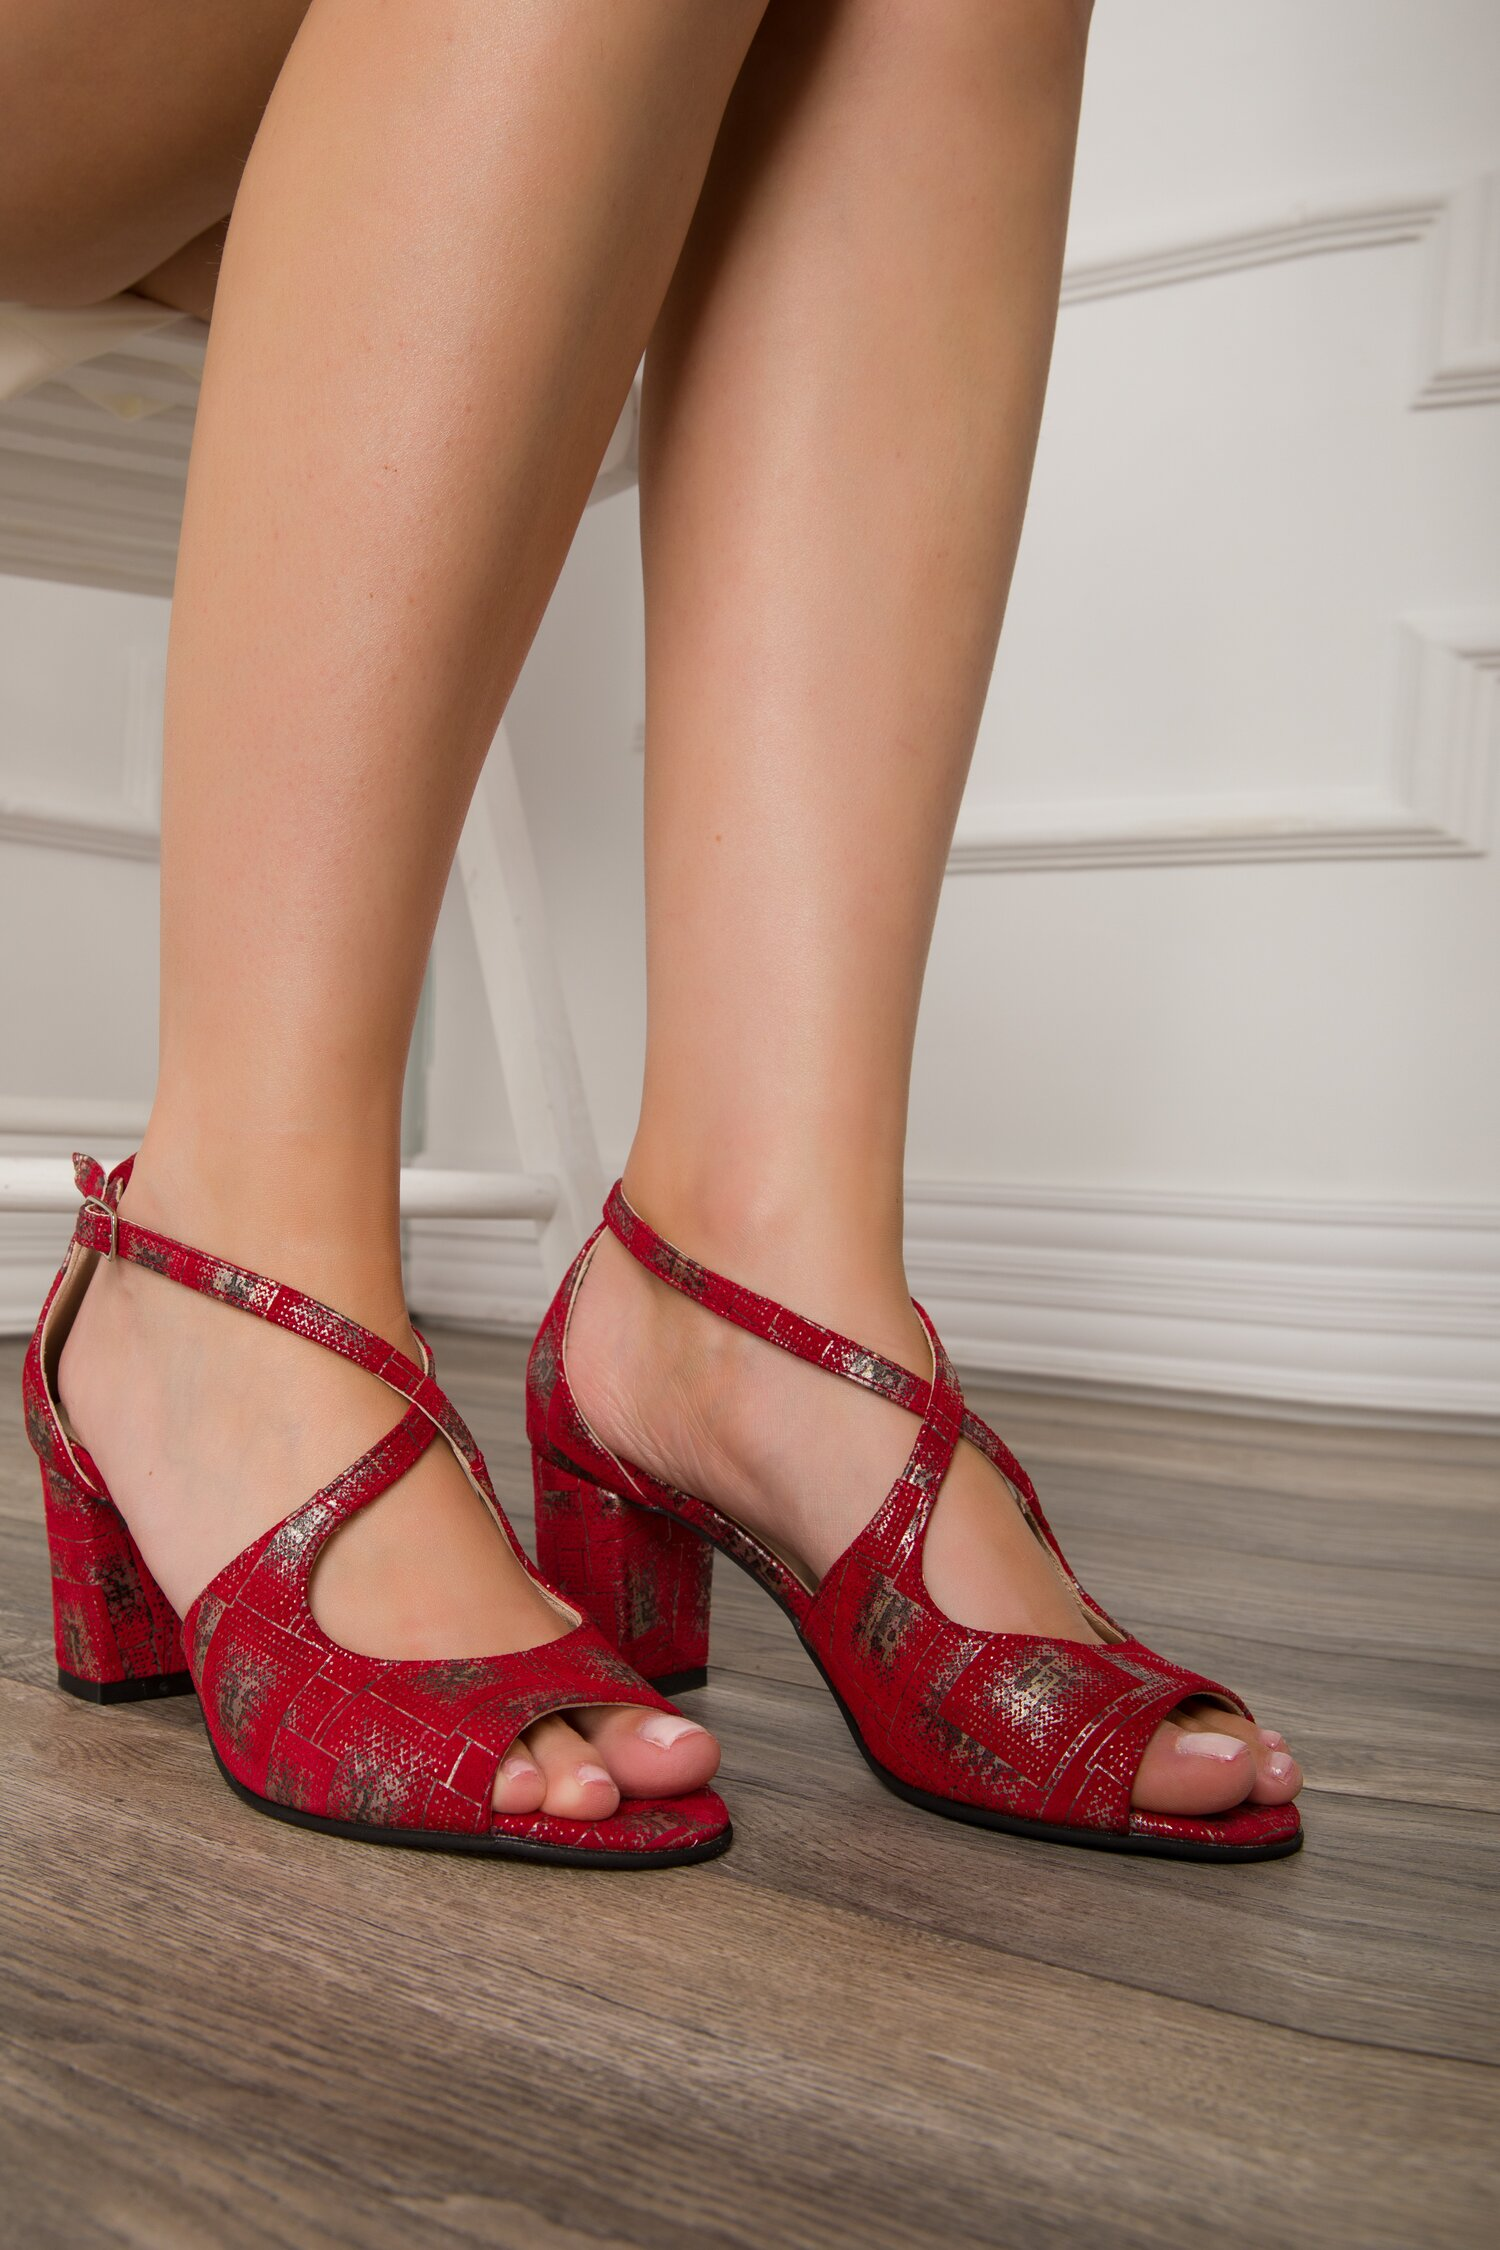 Sandale rosii cu bareta incrucisata si imprimeu argintiu imagine